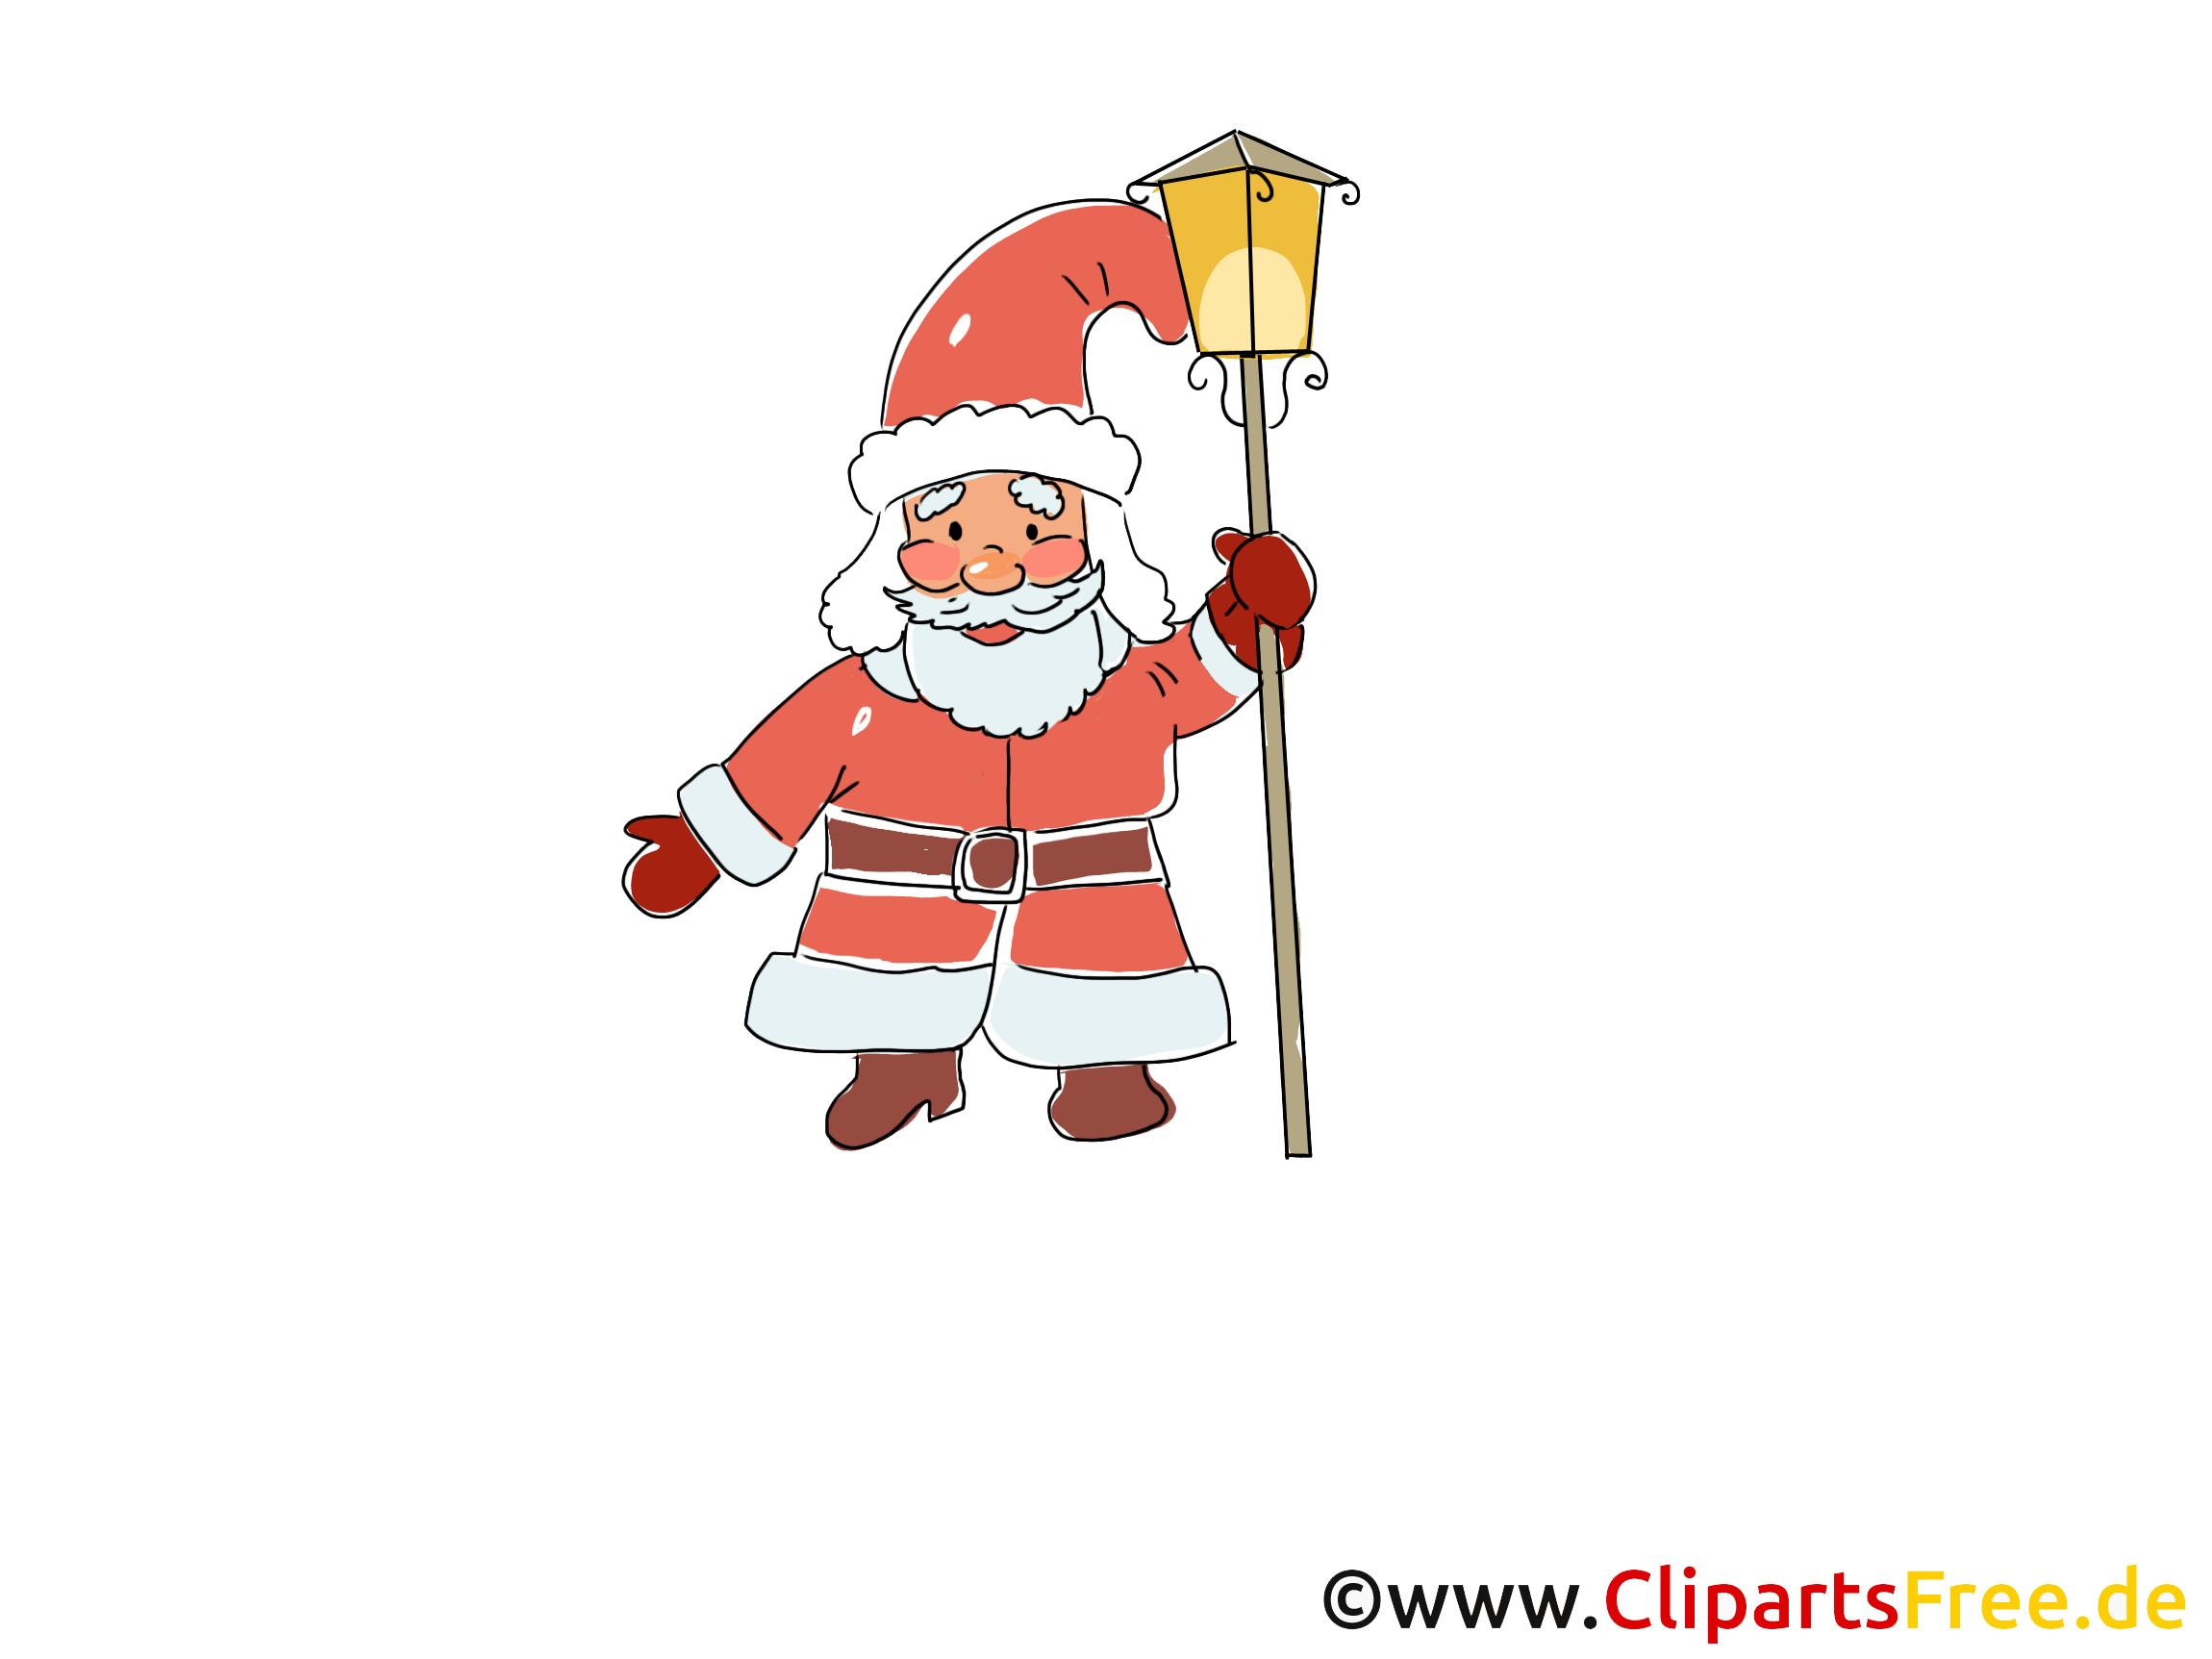 Santa Claus clipart, afbeelding, afbeelding